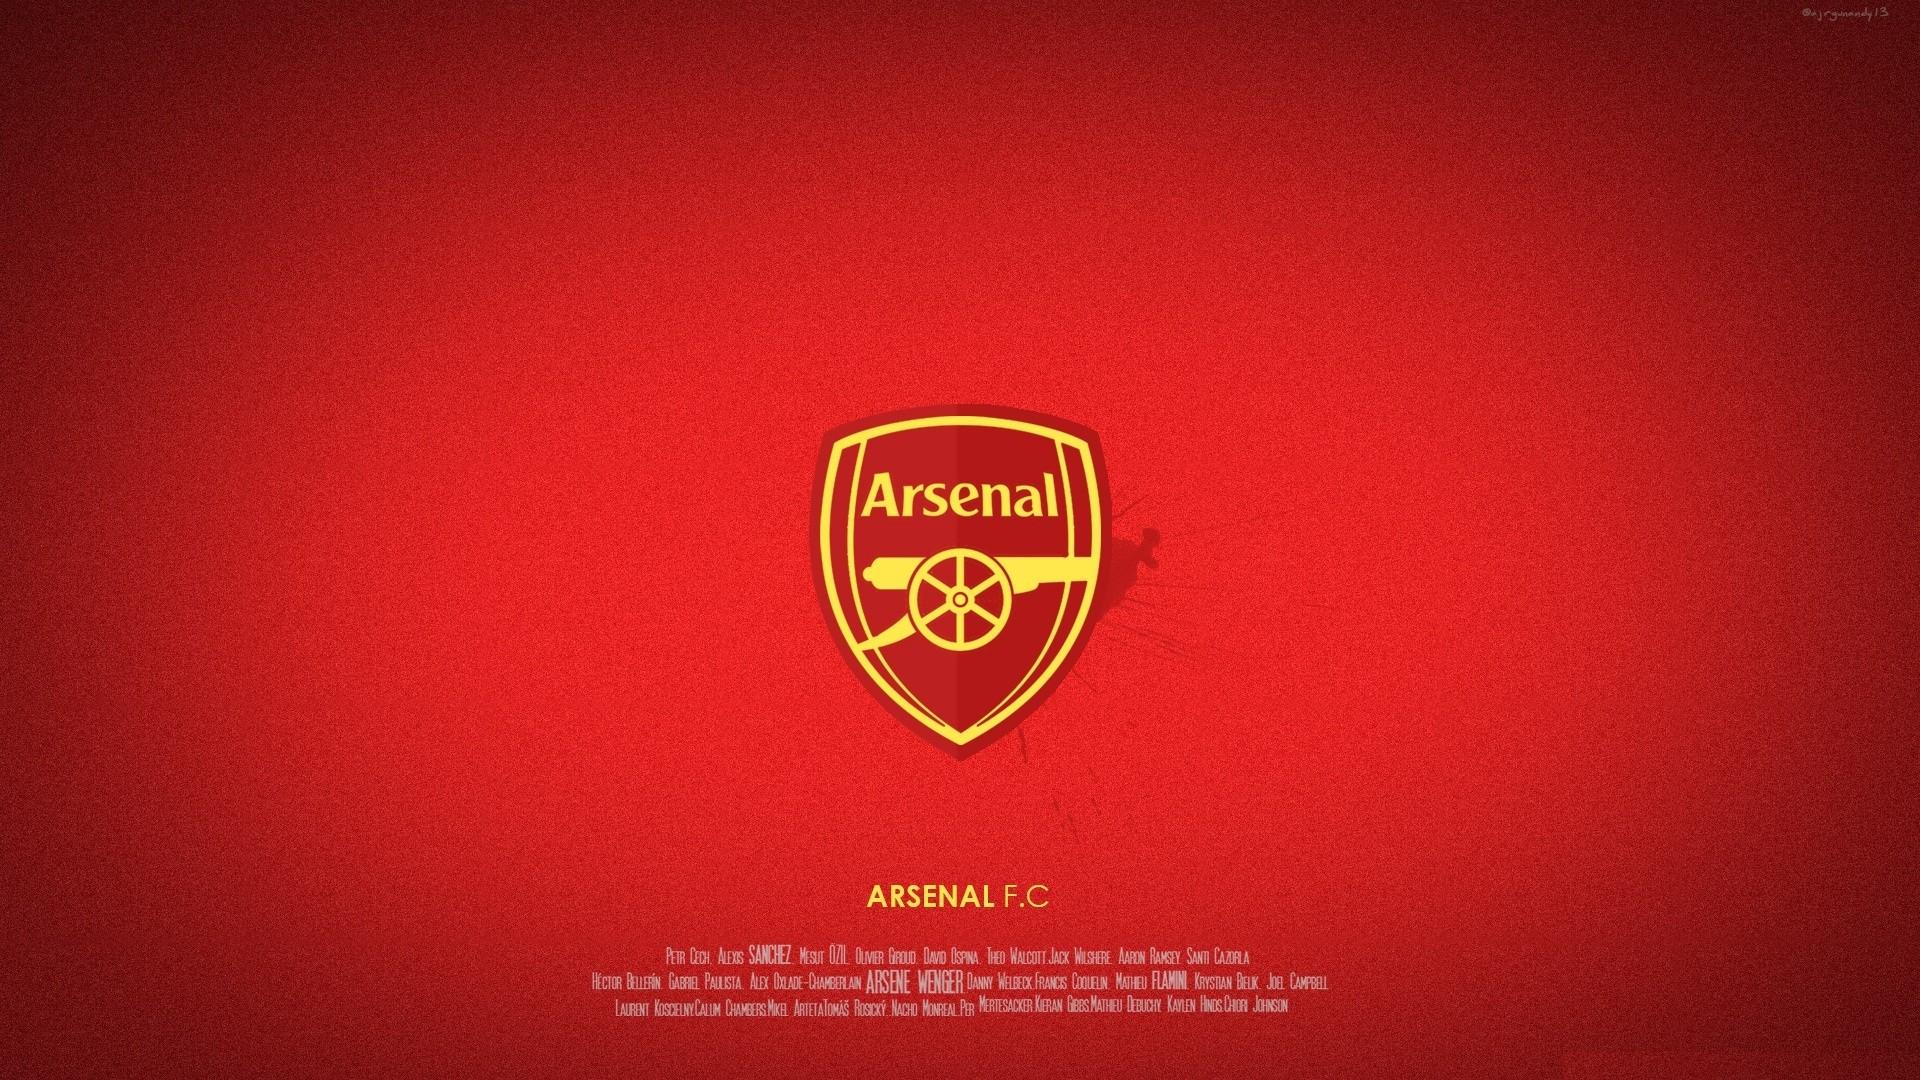 hd arsenal fc wallpaper 2021 live